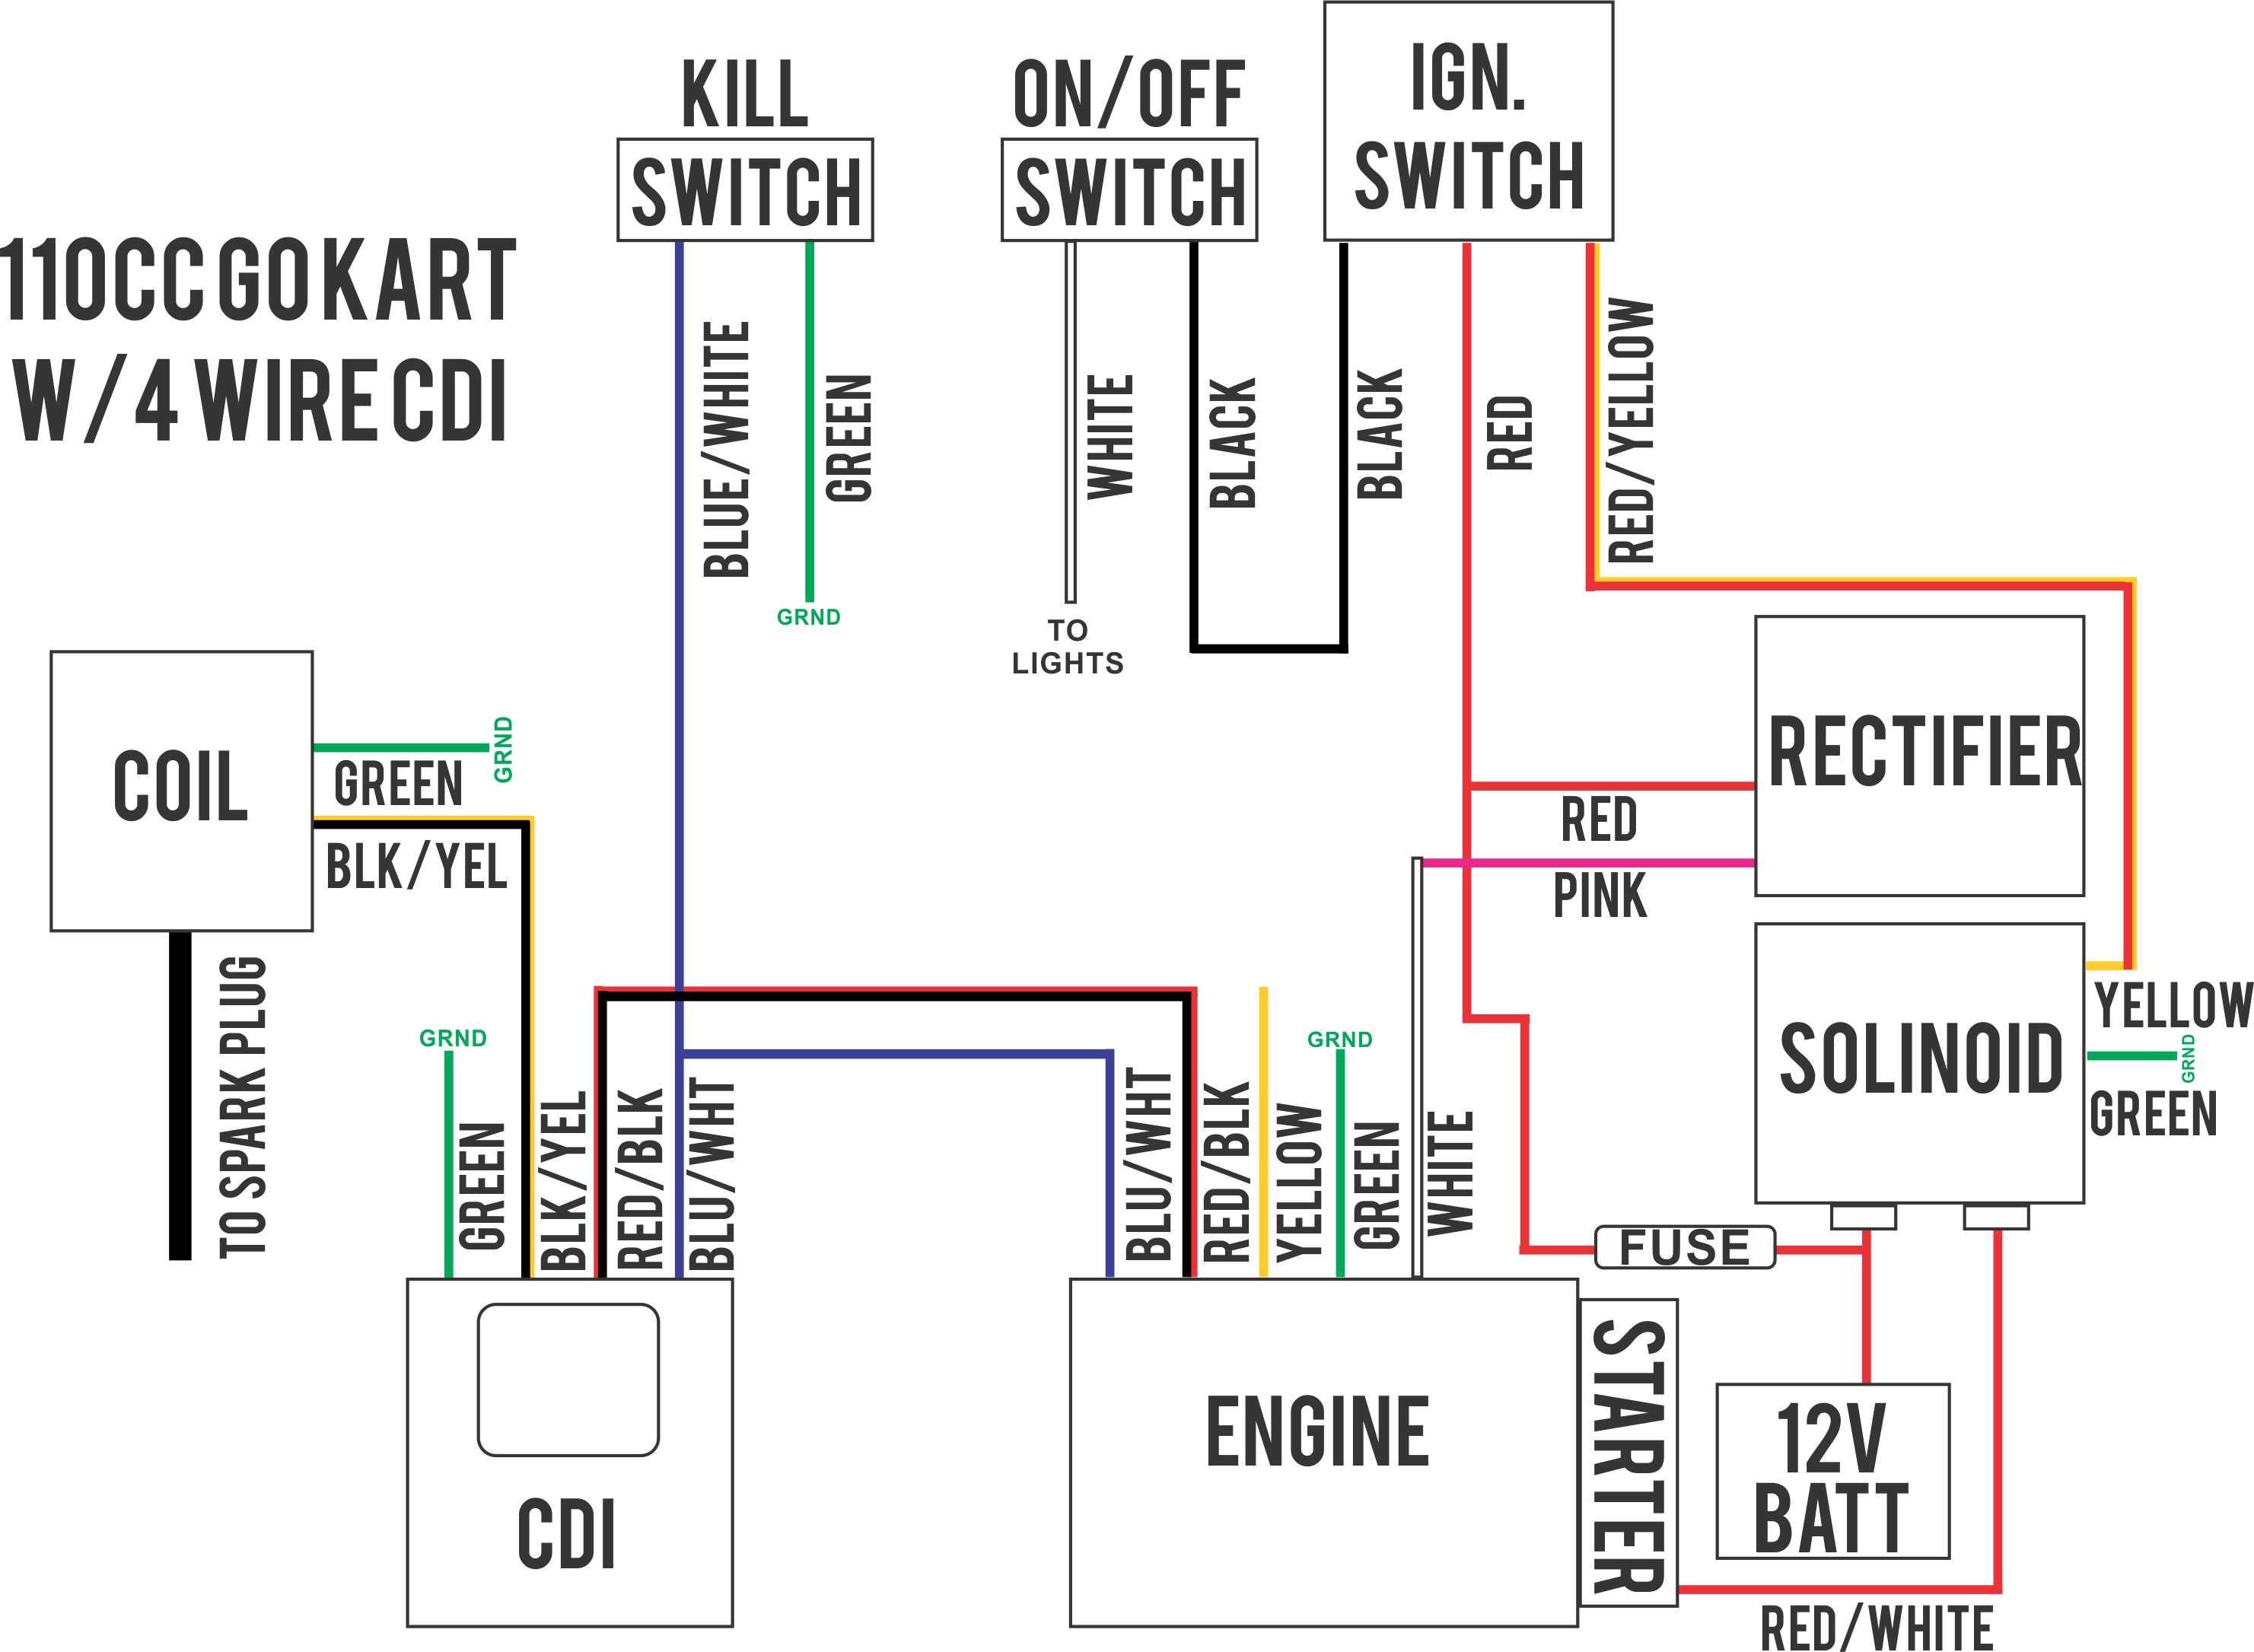 suzuki outboard ignition switch wiring diagram inspirational rh mainetreasurechest com Mercruiser Key Switch Wiring Diagram Diesel Ignition Switch Wiring Diagram